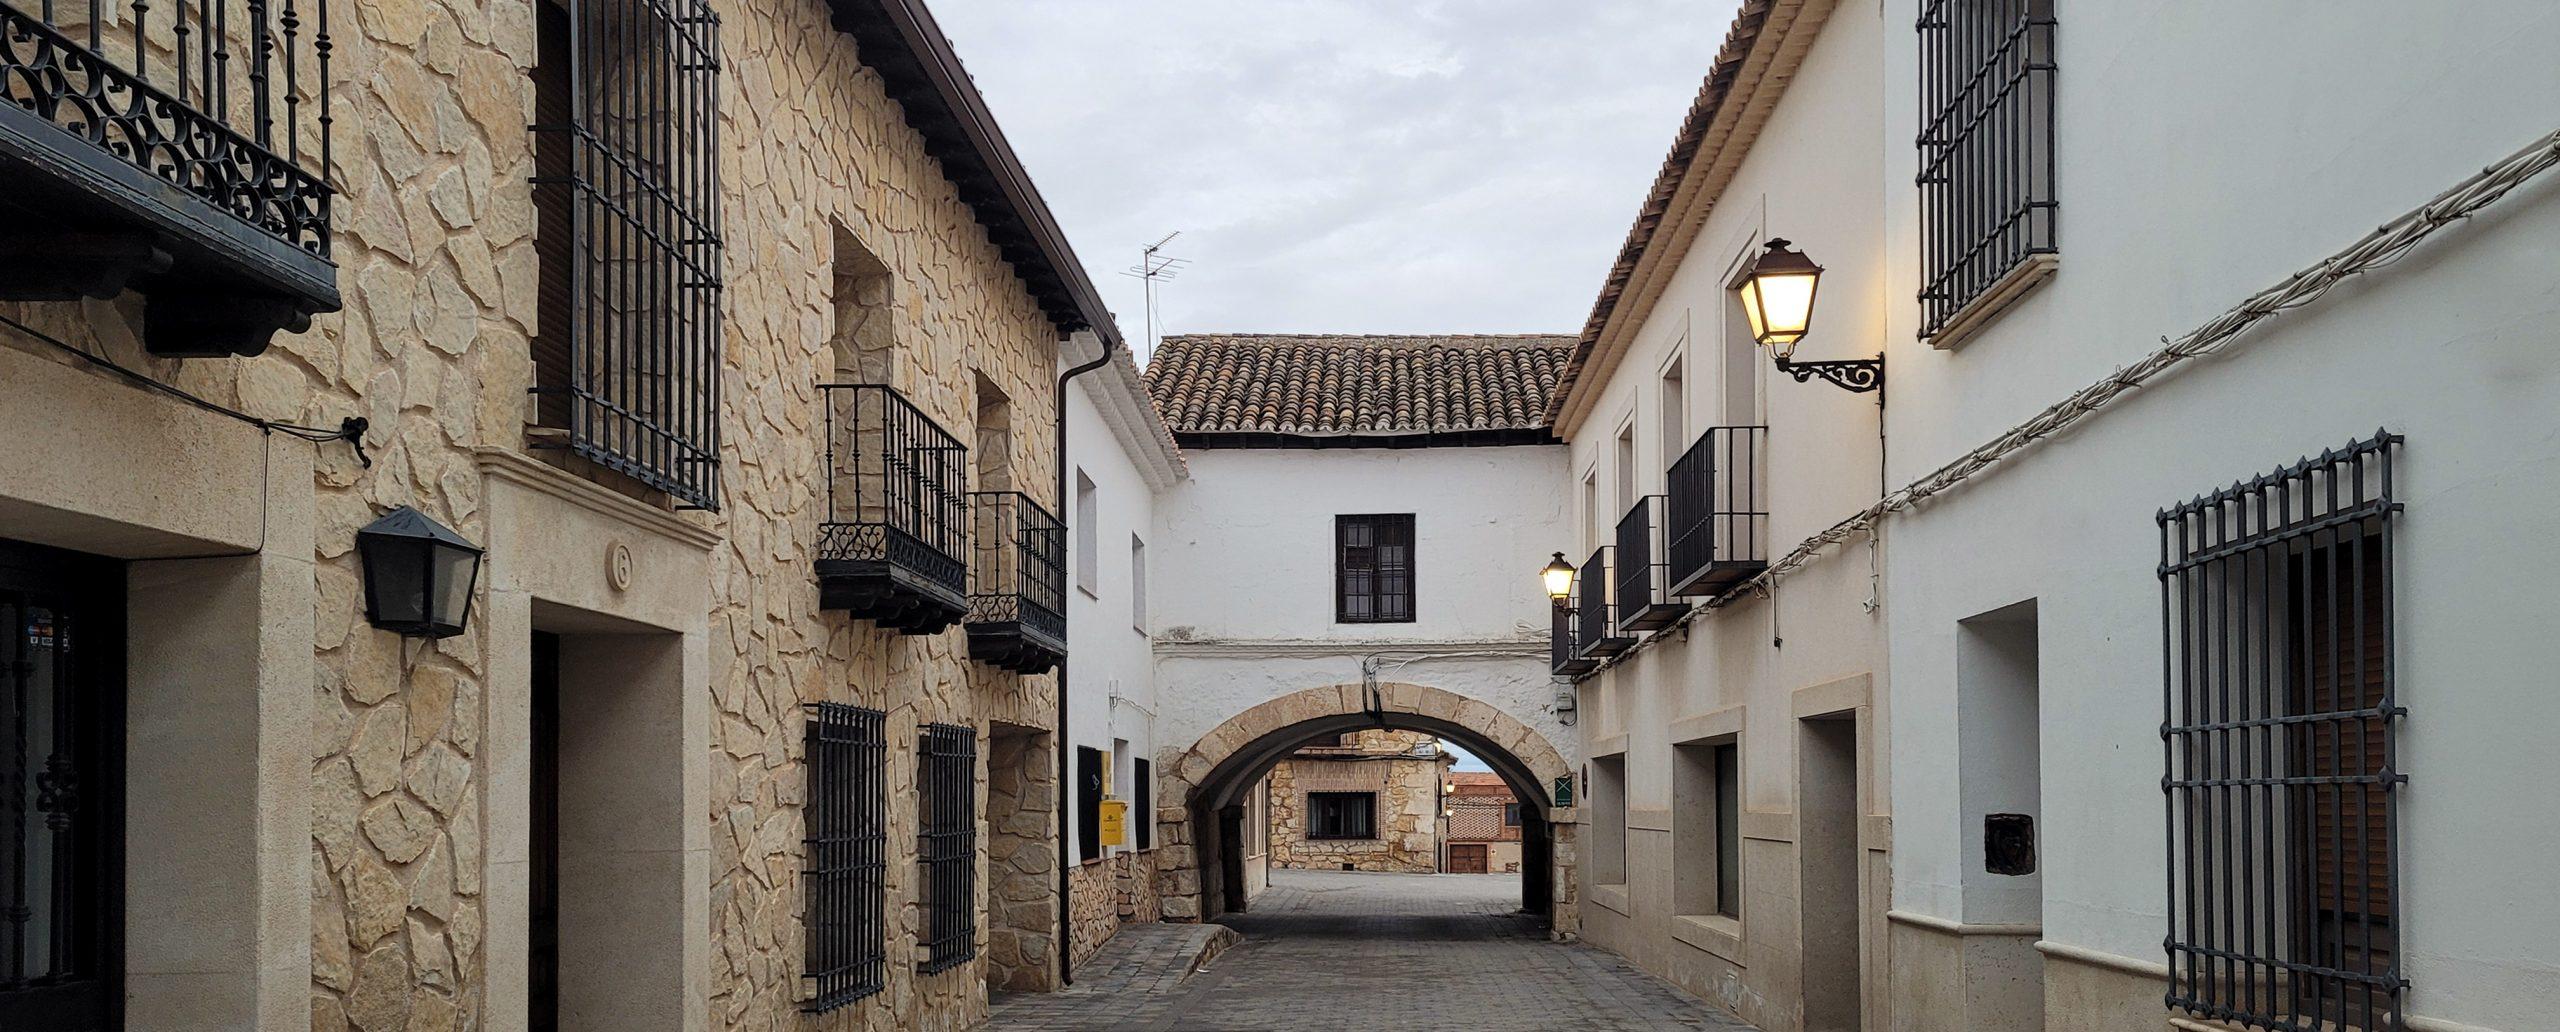 Calle Cervantes el Toboso